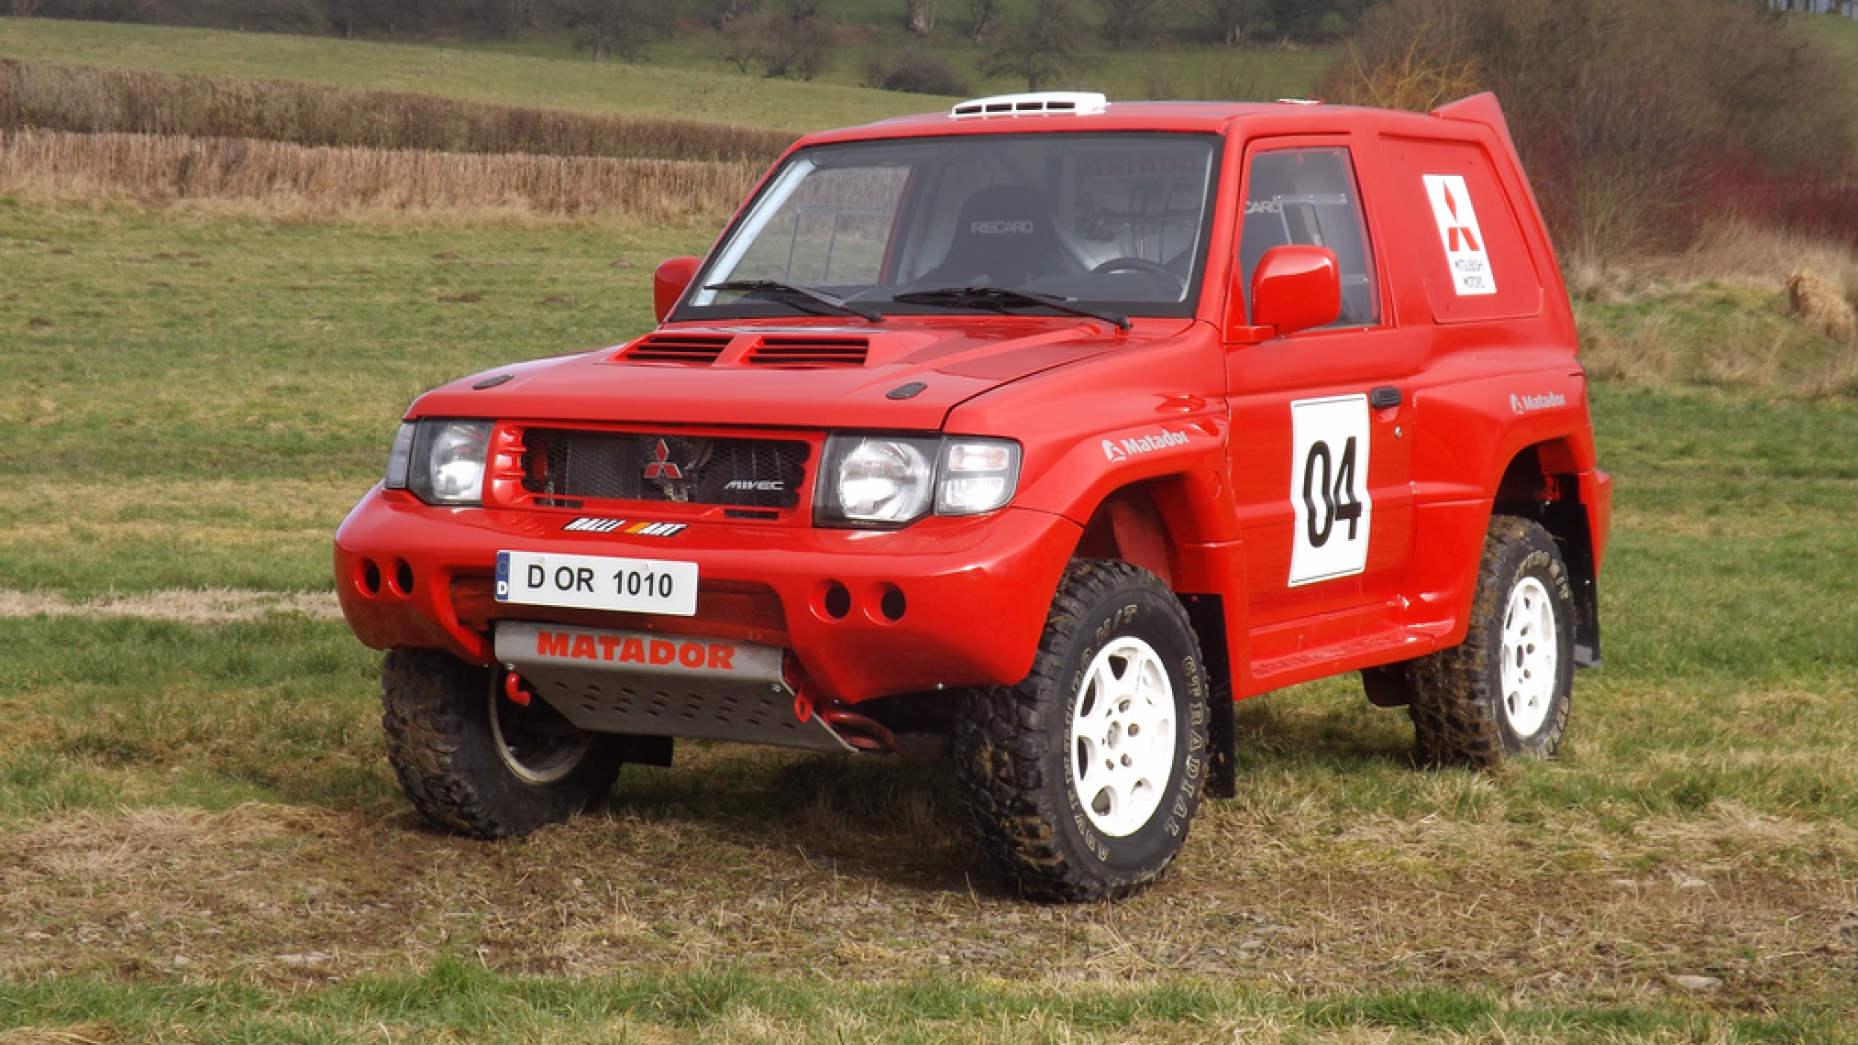 Mitsubishi Pajero Evolution de 1998 (Precio estimado de 17.500 a 23.000 euros)